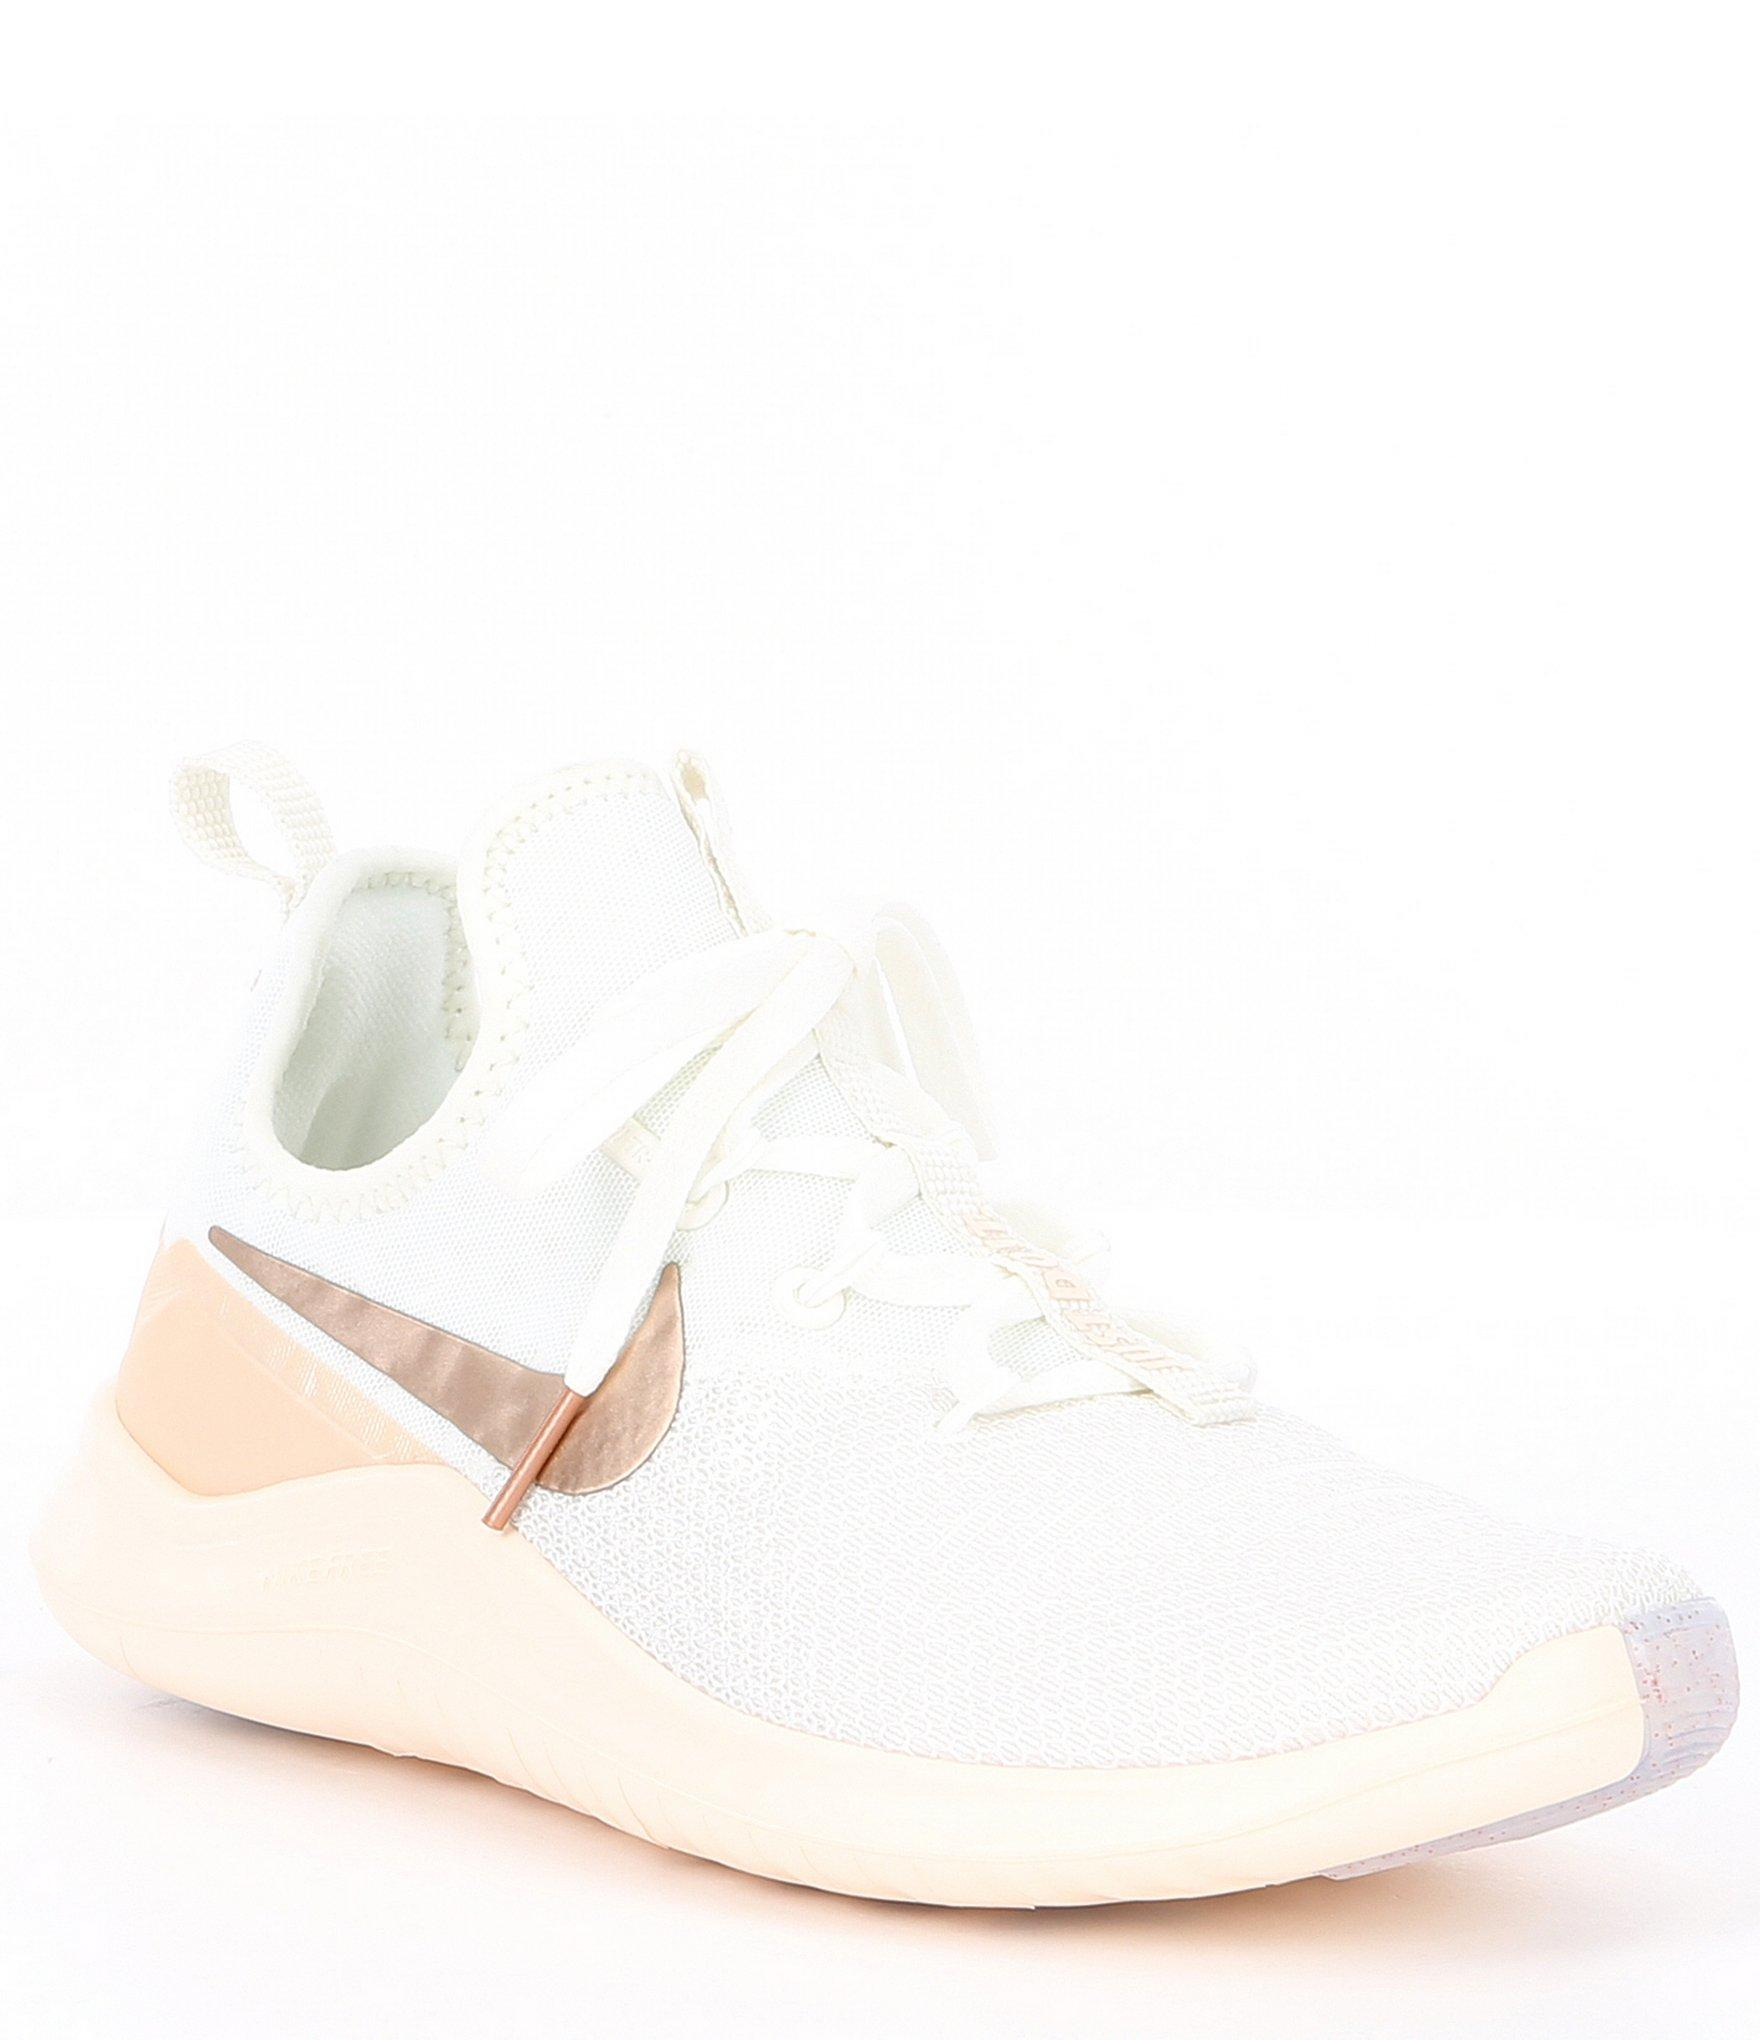 94a56258e049 Nike - Multicolor Women s Free Tr 8 Premium Training Shoe - Lyst. View  fullscreen